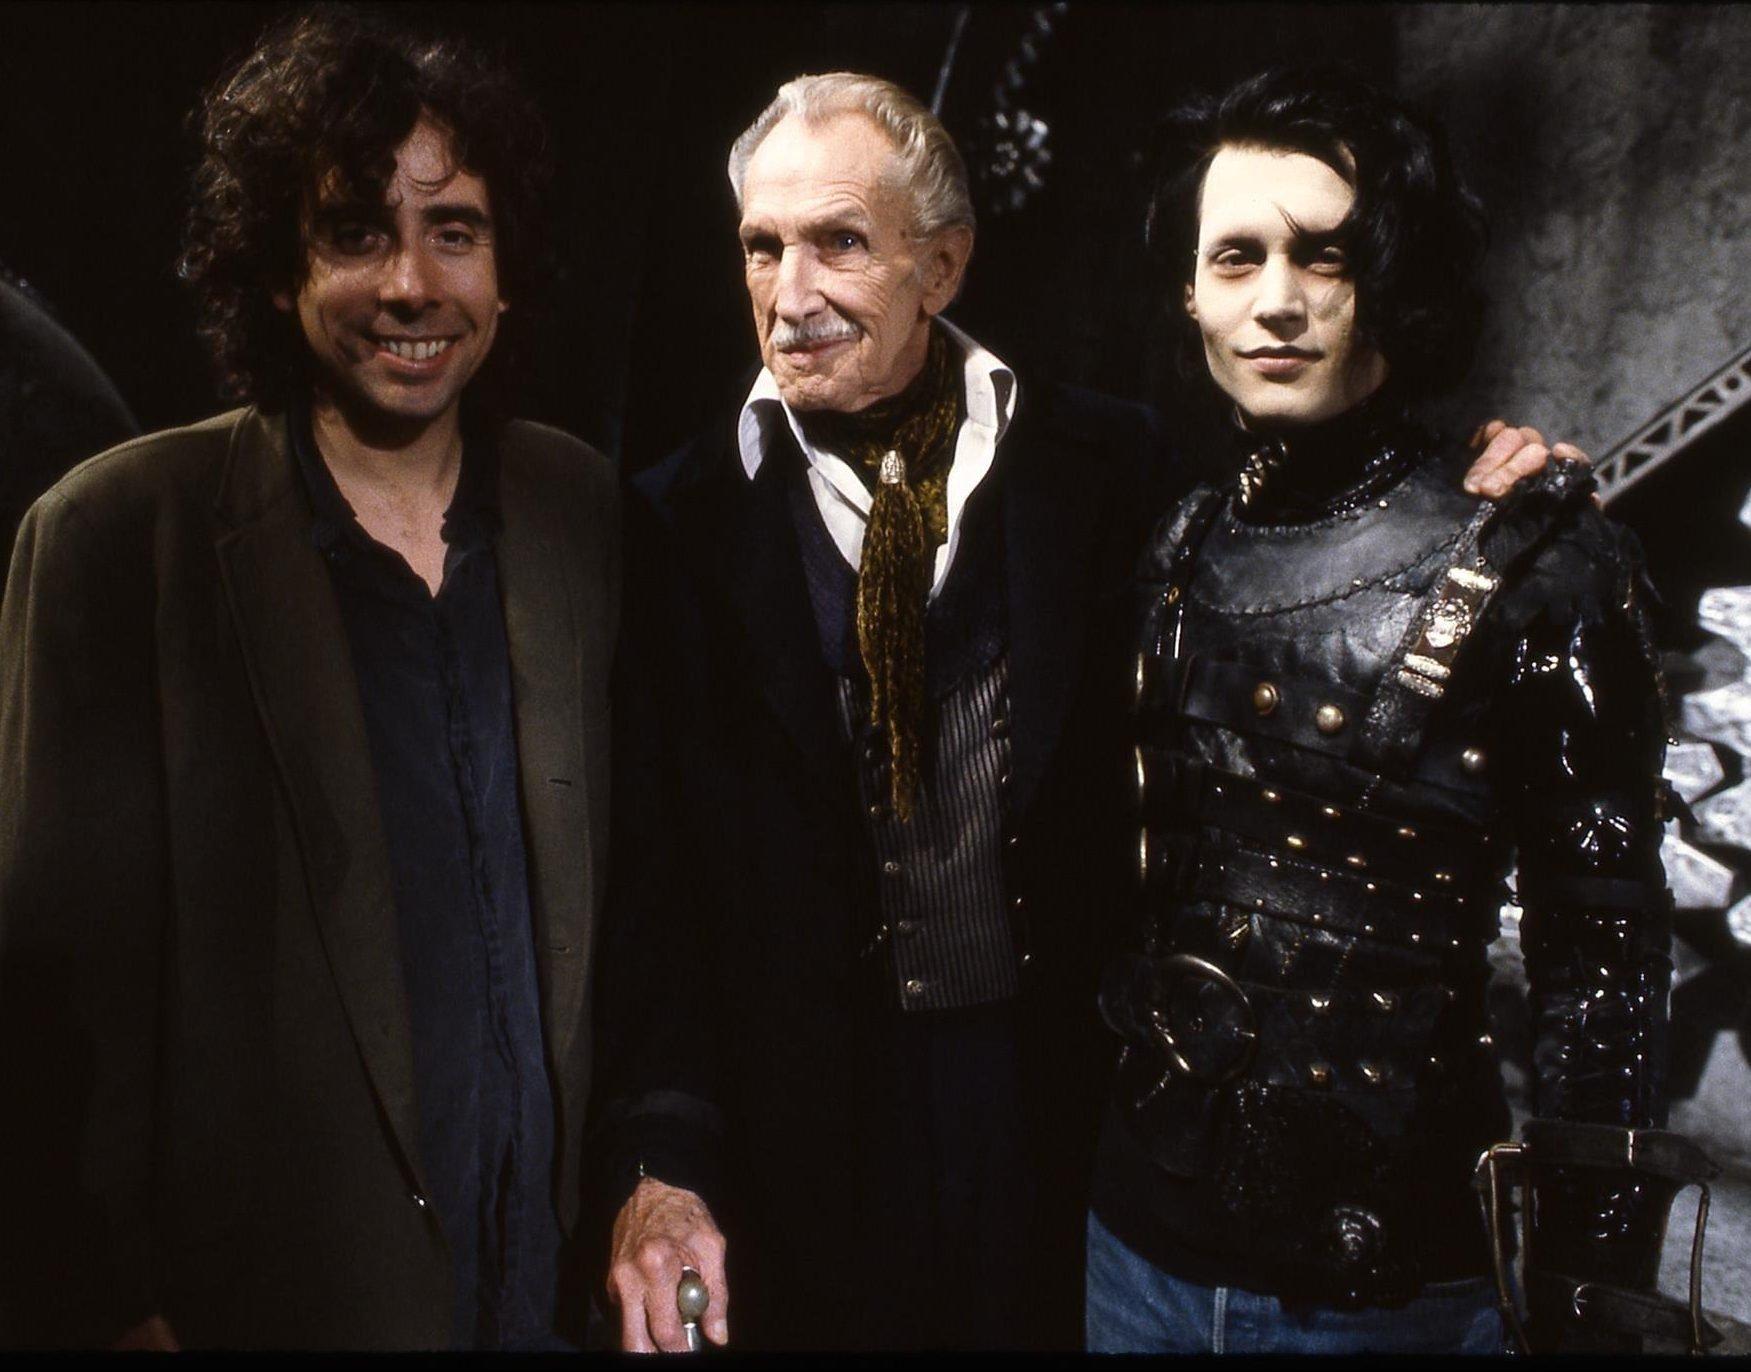 3lr0v18p6i901 e1626793510875 10 Far-Fetched Facts About Tim Burton's Ed Wood